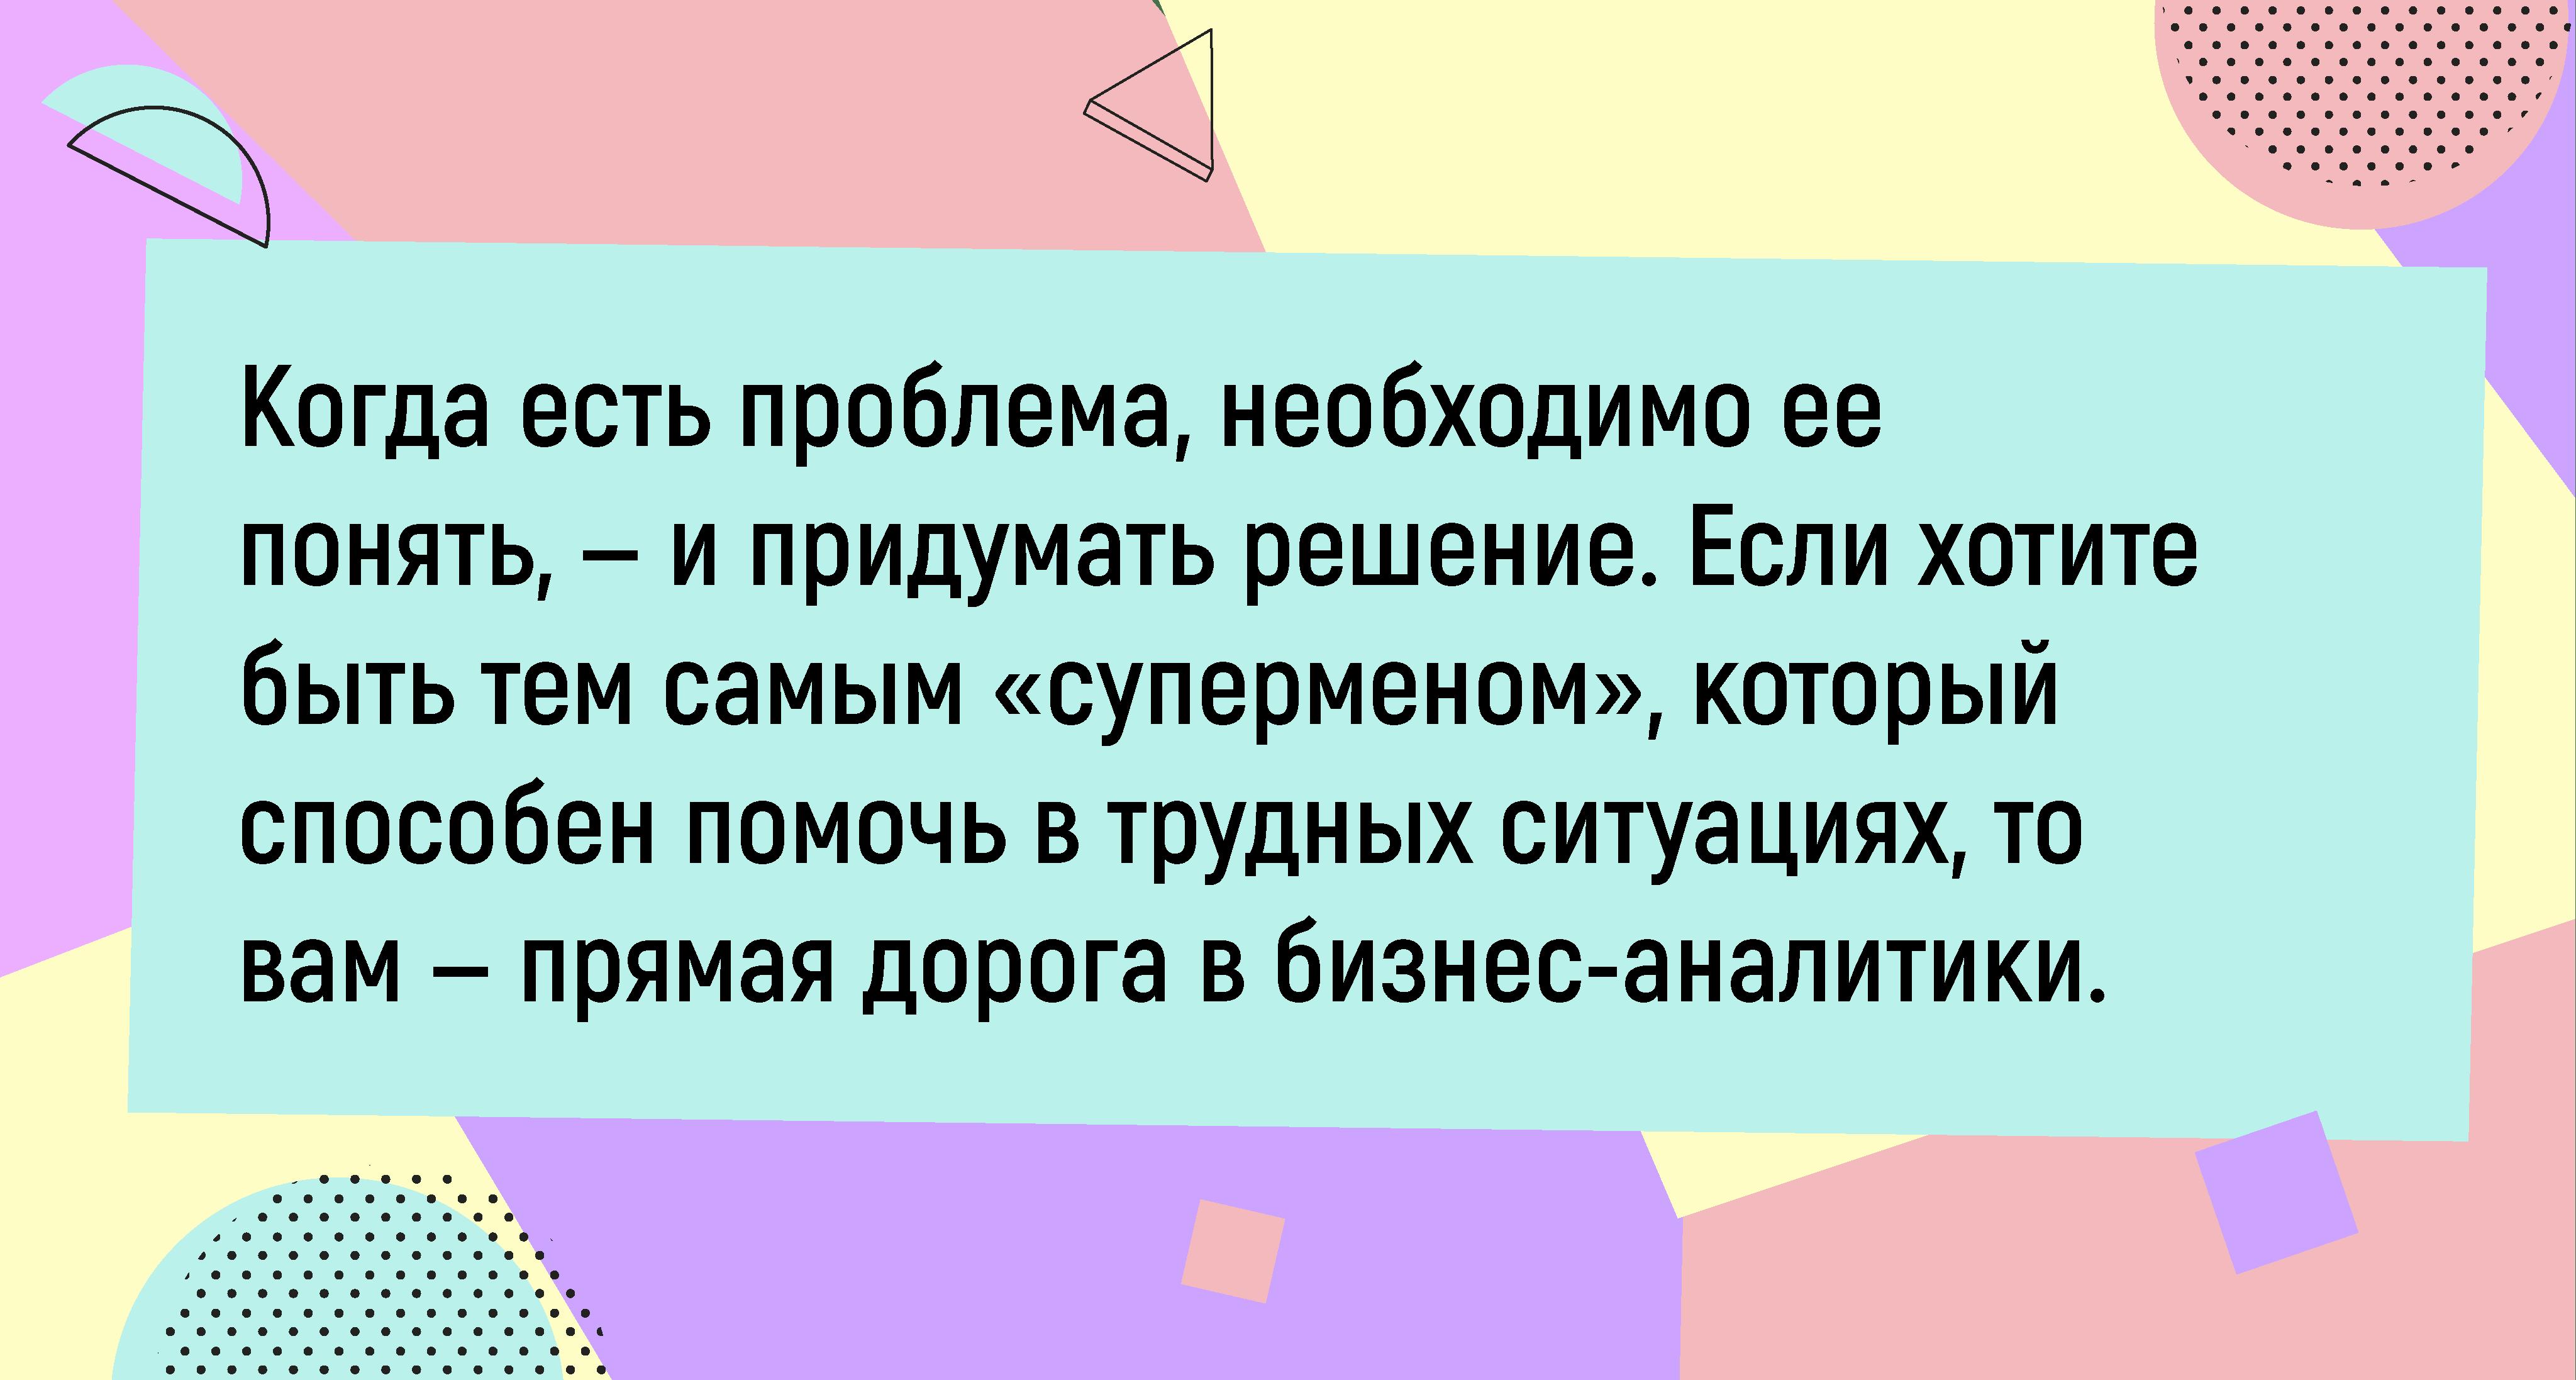 Как Влада Василенко стала бизнес-аналитиком в IT-компании 3